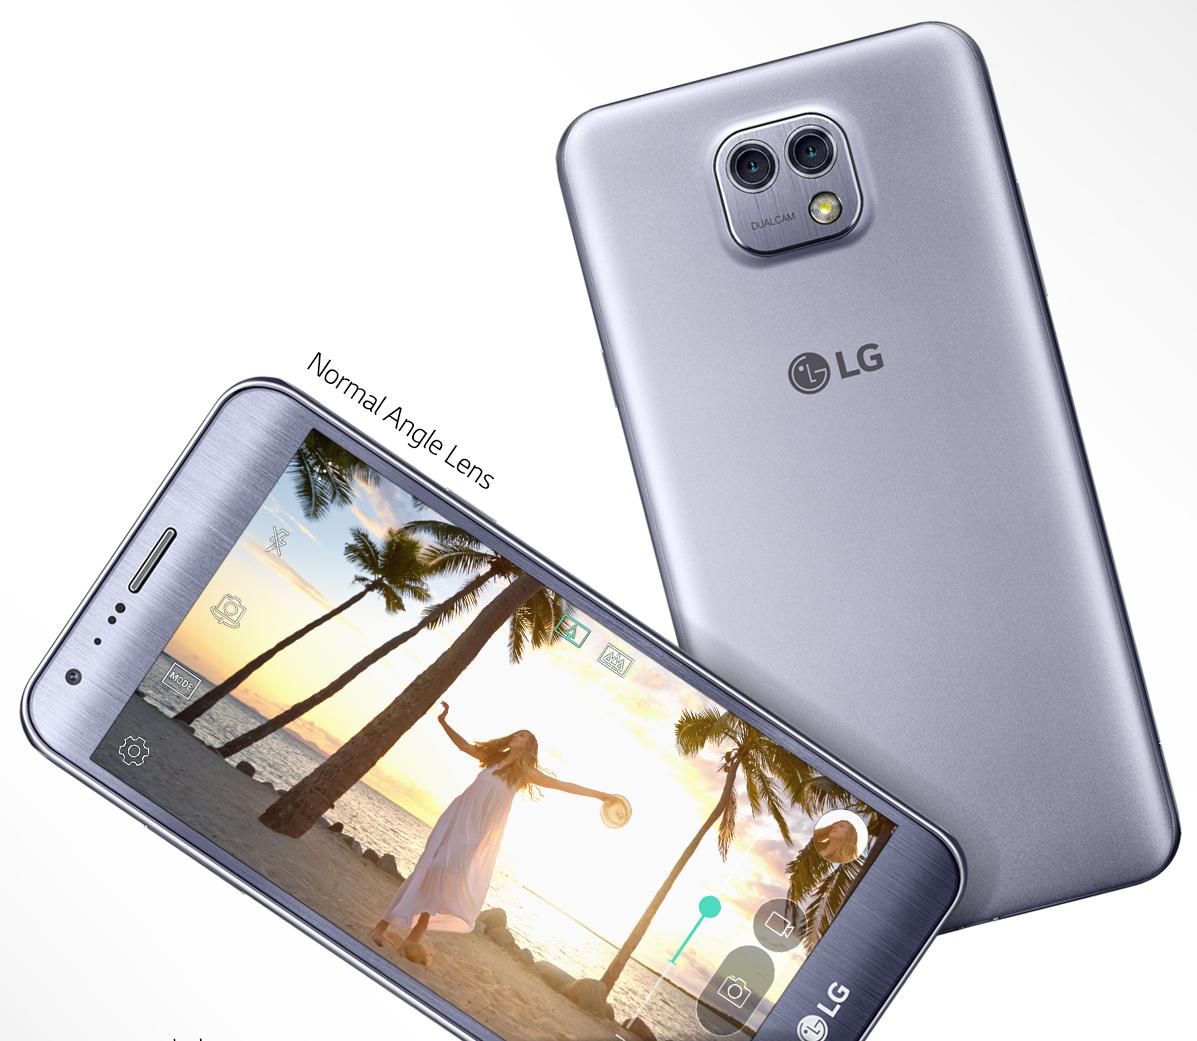 LG X Cam libre, precio, análisis, características, movil con buena camara barato, alternativas